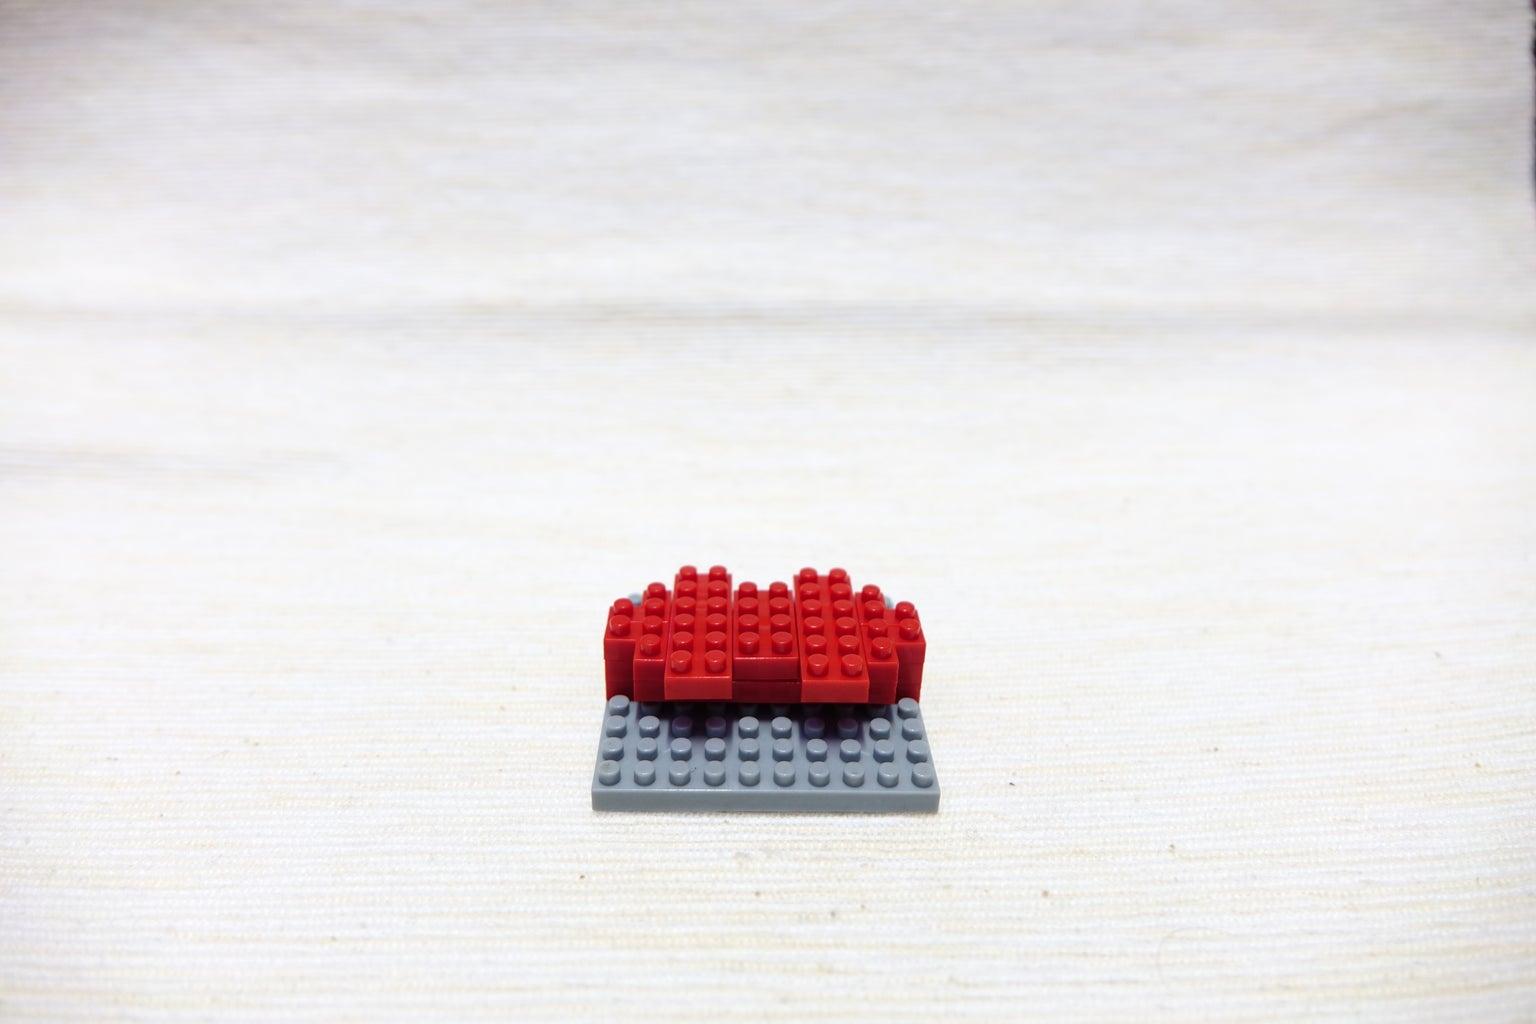 Red Block 2*2 Corner, 2*2 Corner